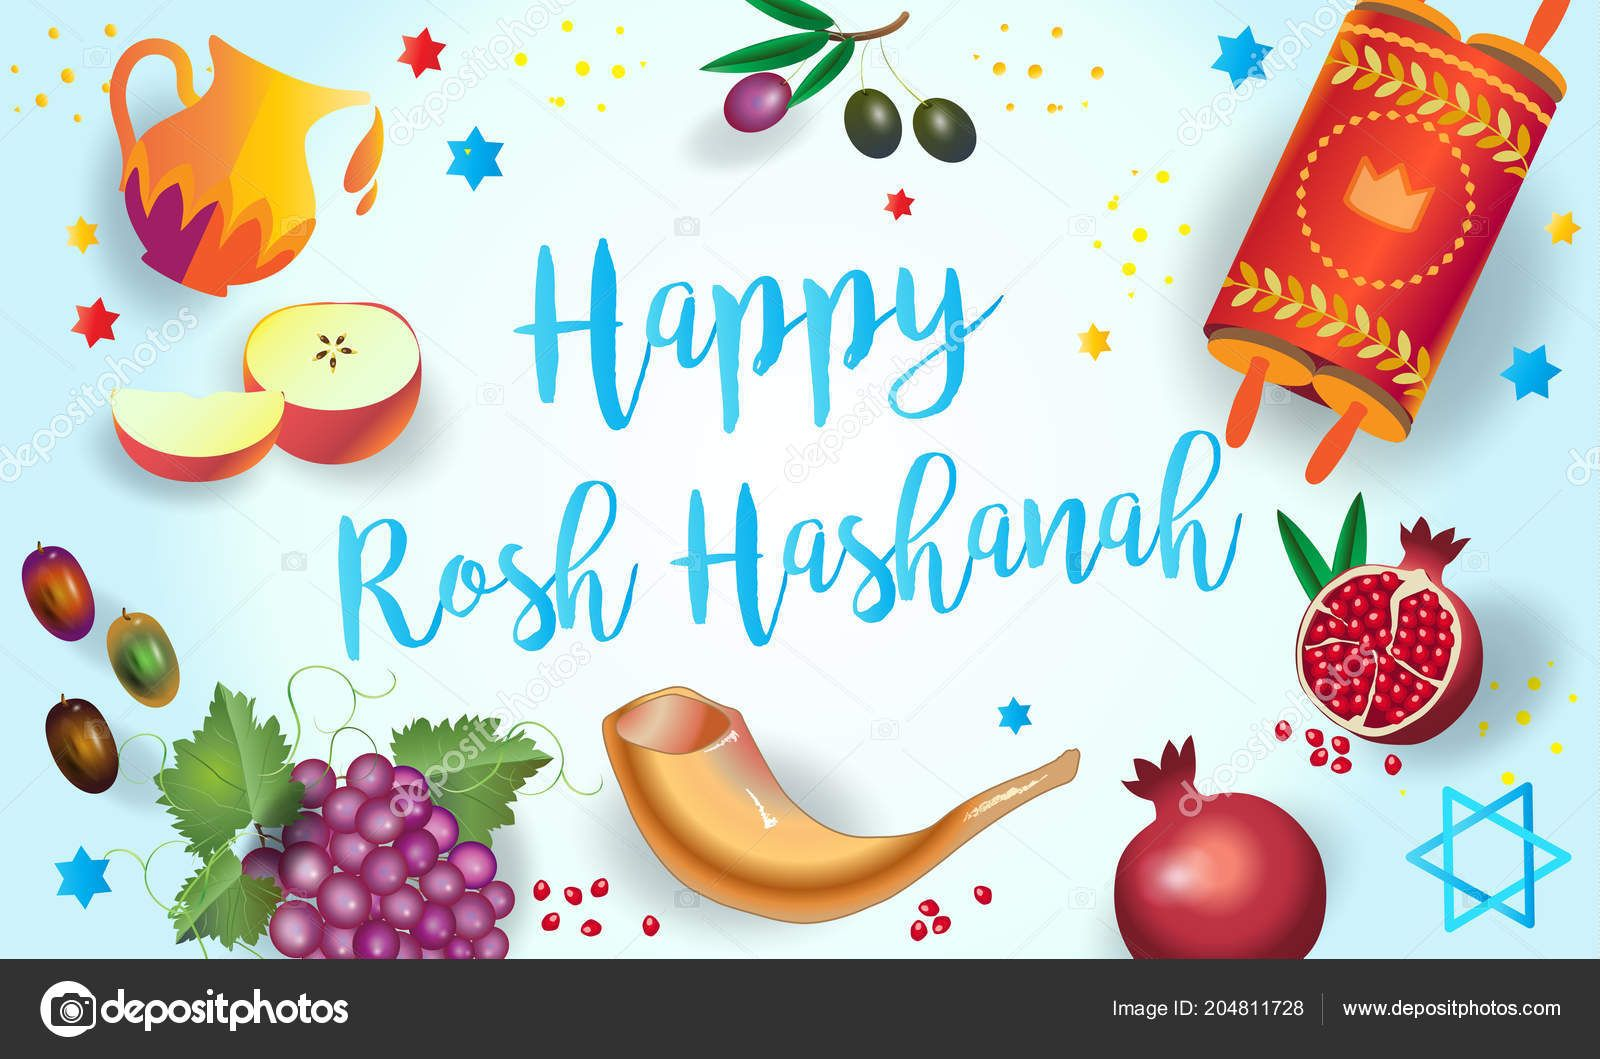 Download - Happy Rosh Hashanah Greeting Card Jewish New Year Text Shana —  Stock Illustration   Happy rosh hashanah, Rosh hashanah greetings, Rosh  hashanah